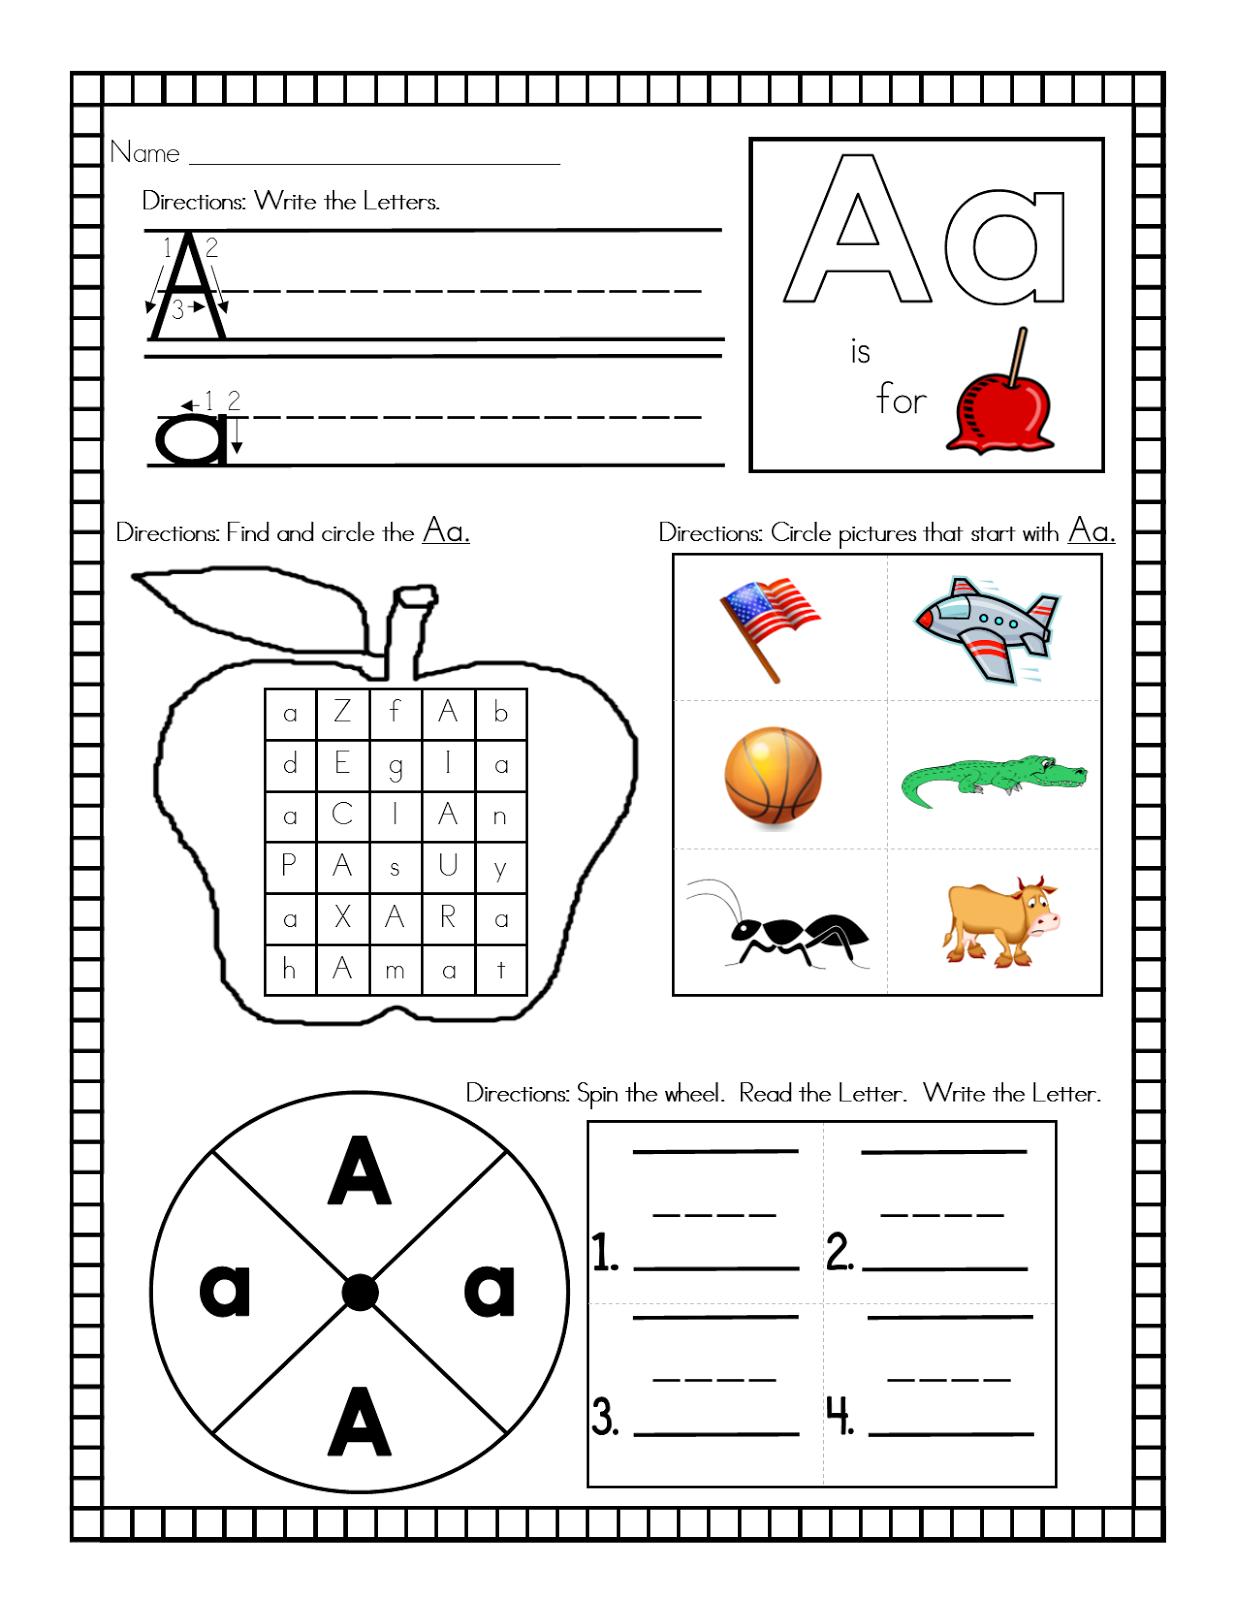 Teachers R Us Alphabet Letter Activities